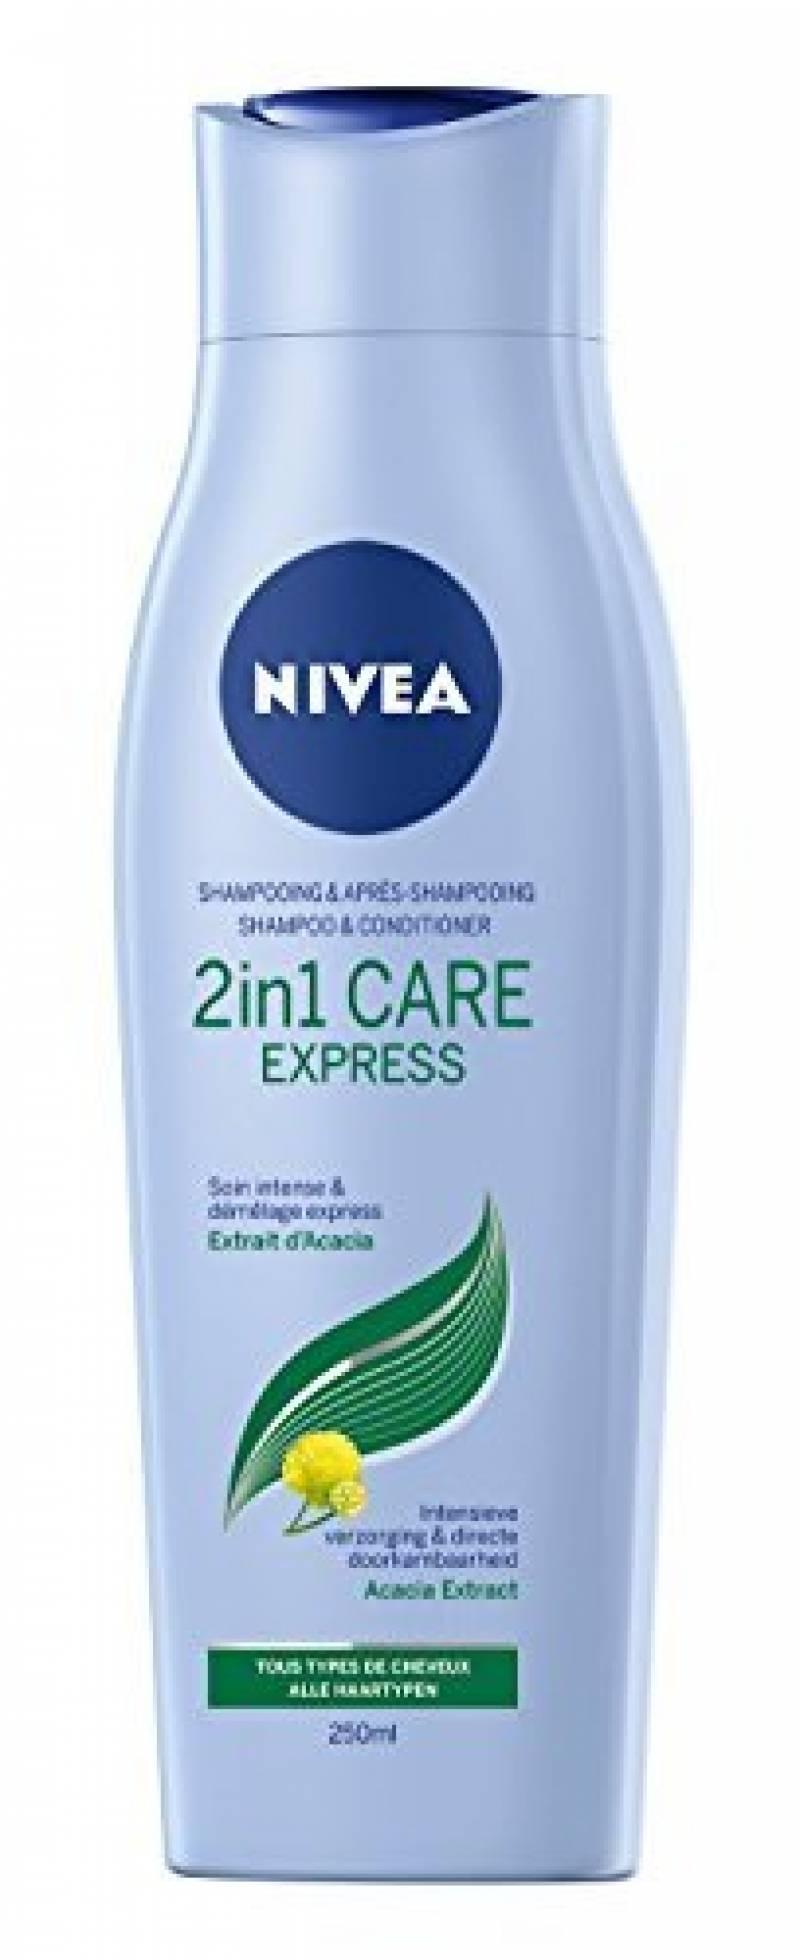 NIVEA Shampooing 2en1 Care 250ml - Lot de 3 de la marque NIVEA TOP 2 image 0 produit